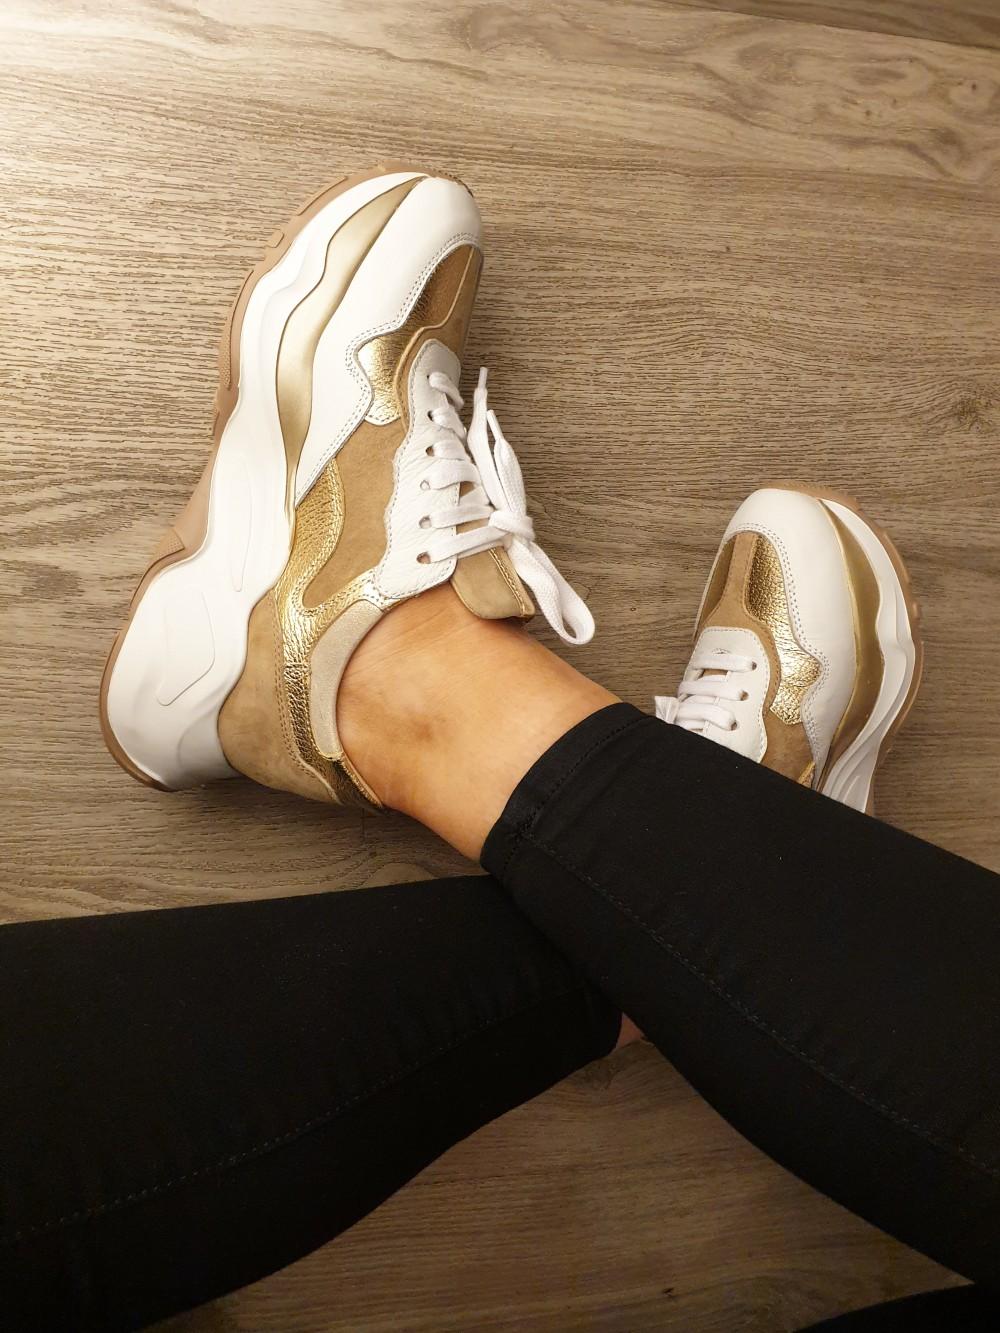 Laura Bellariva Alce White Zeus Gold